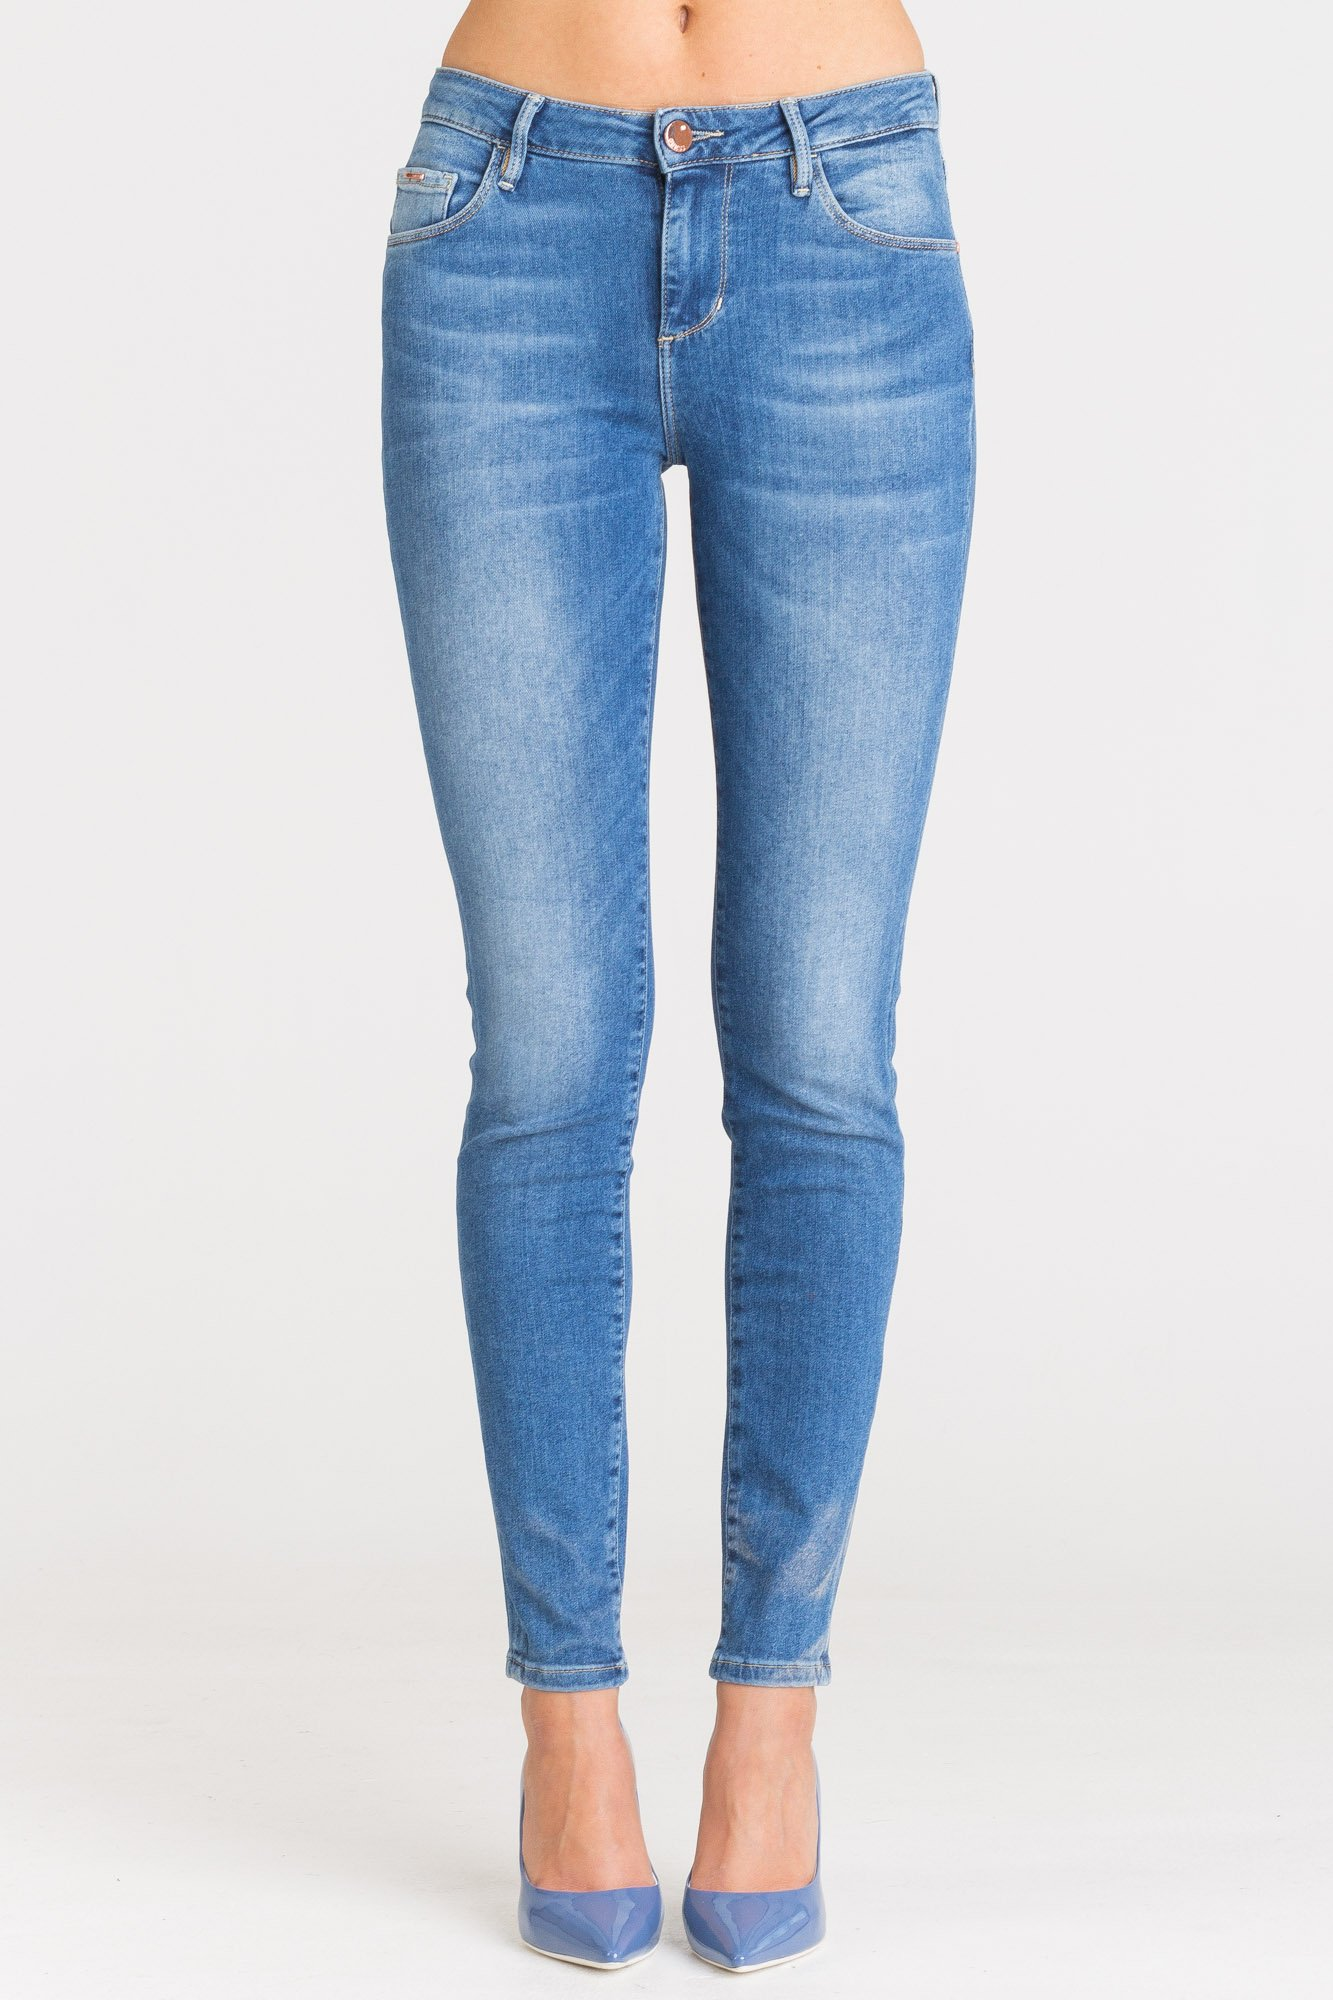 06ec3d495771f ... Niebieskie jeansy damskie Guess Annette Skinny High ...